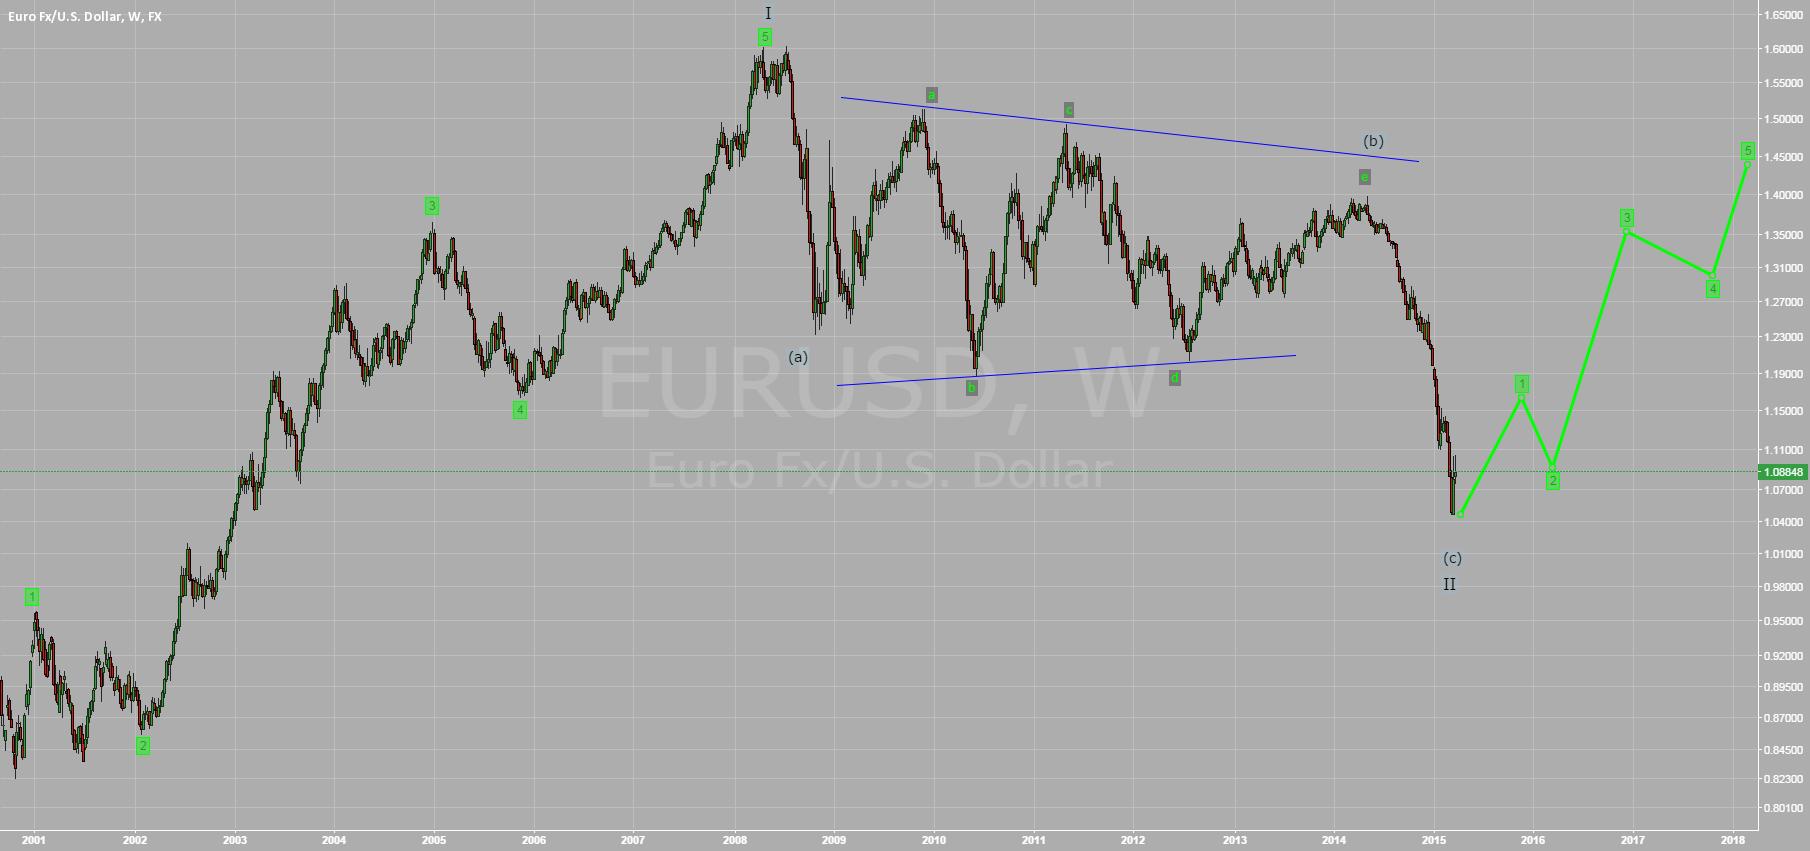 Week3: EURUSD will rise